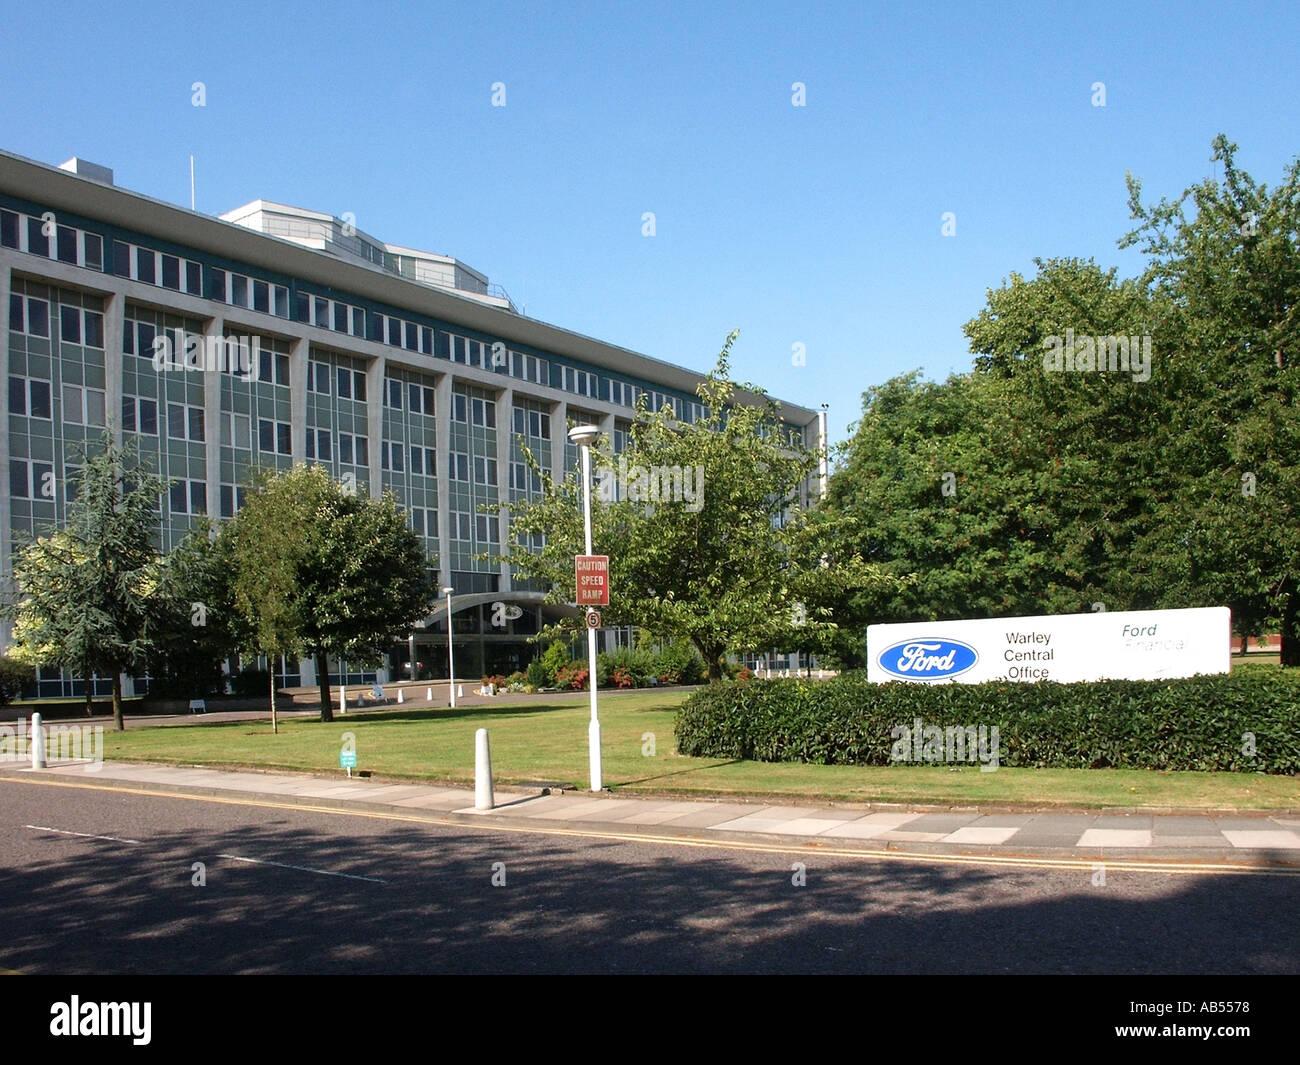 Bürogebäude der Ford Motor Company Warley Zentrale Brentwood Essex England Großbritannien Stockbild